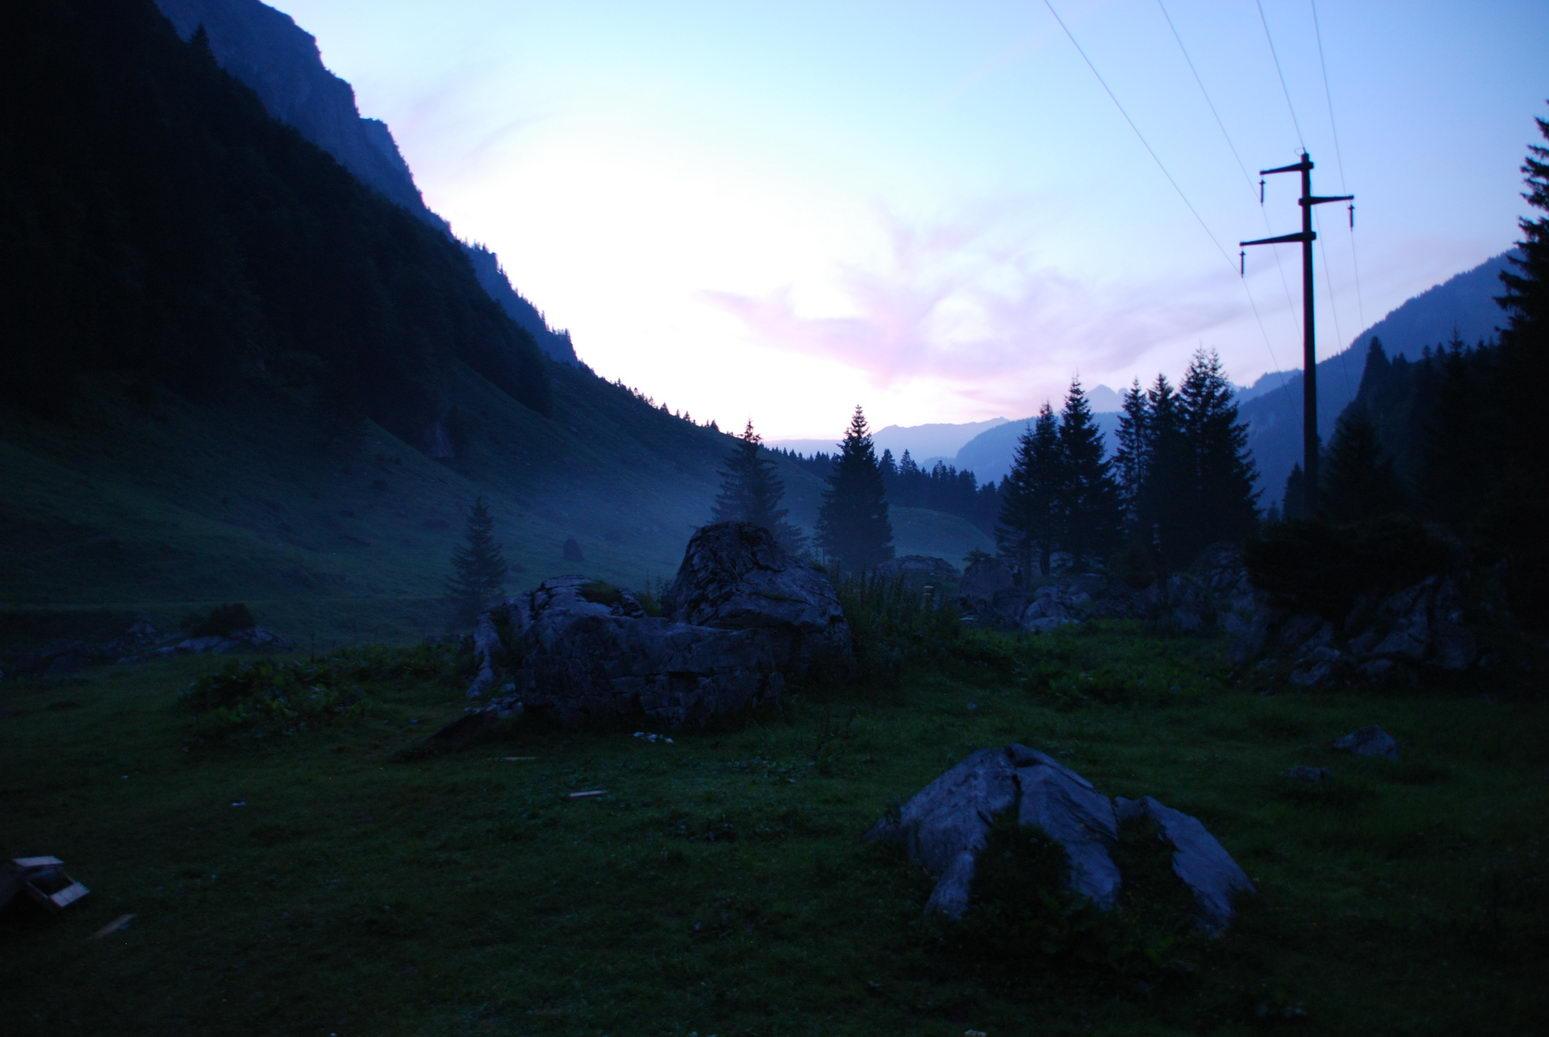 misty-view-from-dinner-swiss-o-week-switzerland